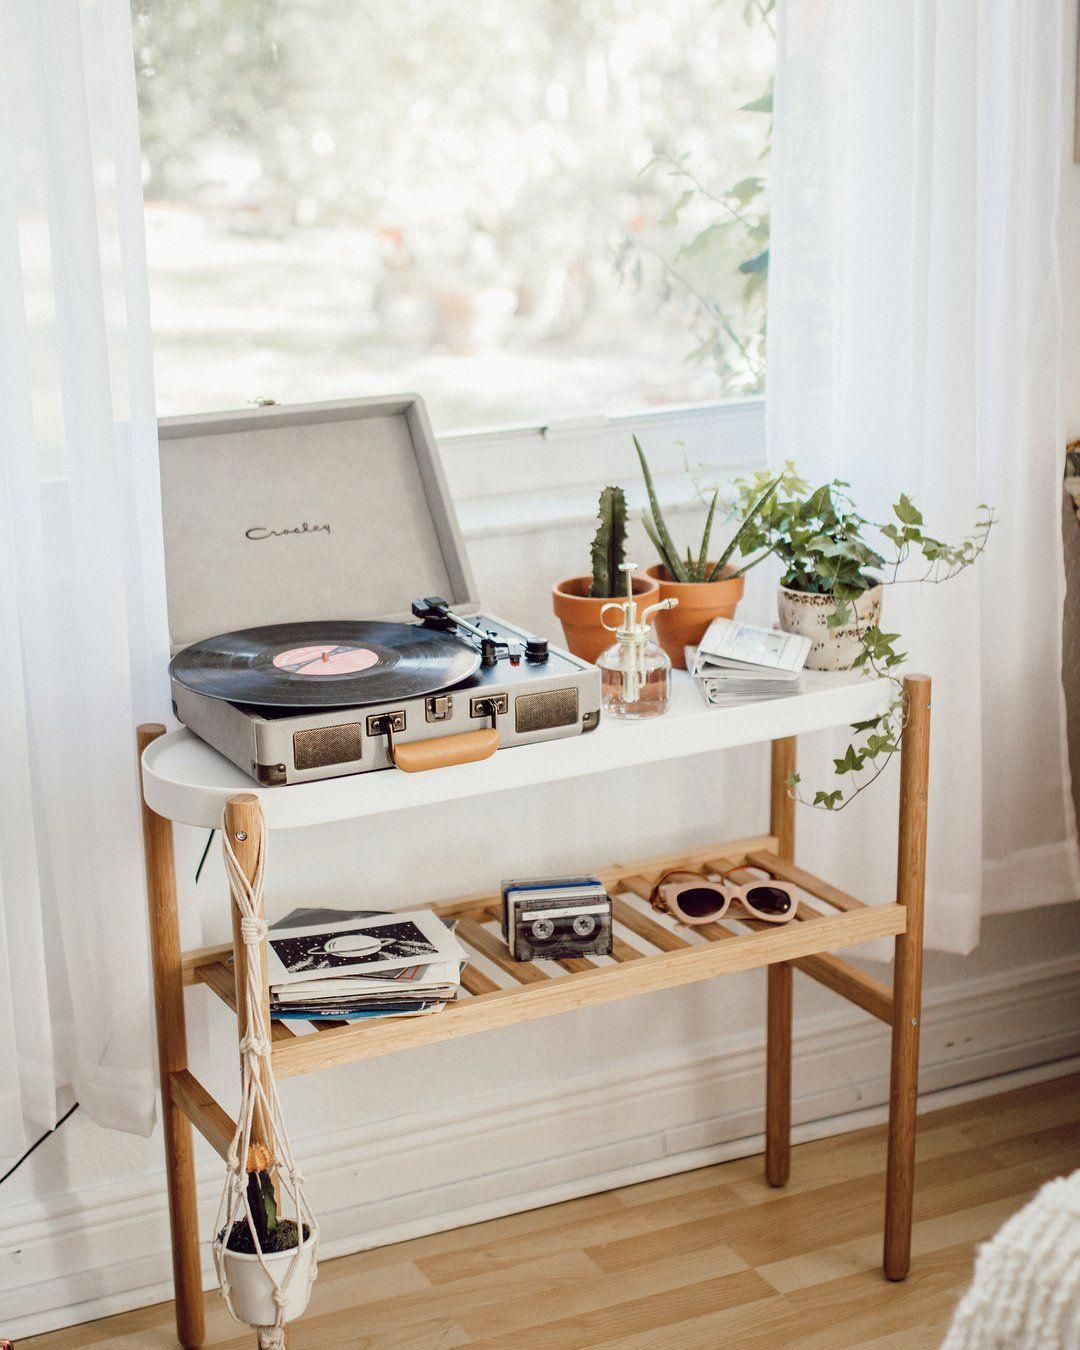 Crosley Antique Grey Cruiser Bluetooth Vinyl Record Player Urban Outfitters Home Gifts Music Tech Slaapkamerideeen Slaapkamer Interieuren Huis Ideeen